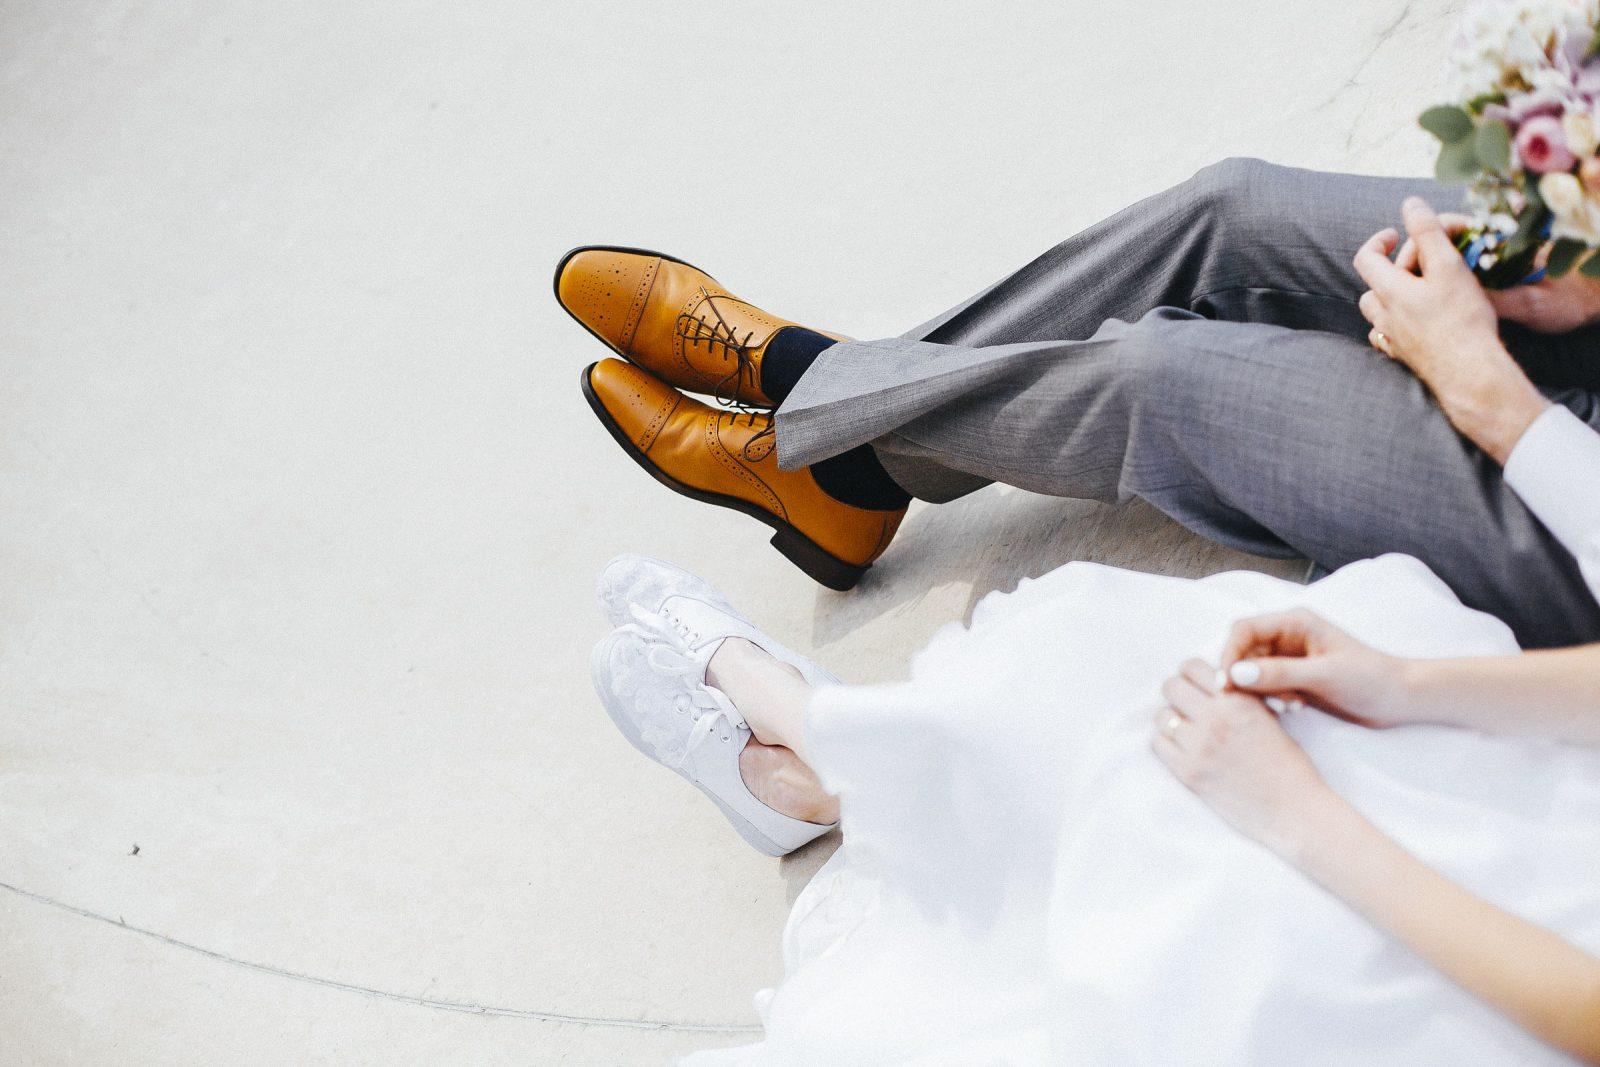 Edinburgh Alternative Wedding Photographer   Skate Park Photoshoot Elopement   Ceranna Photography